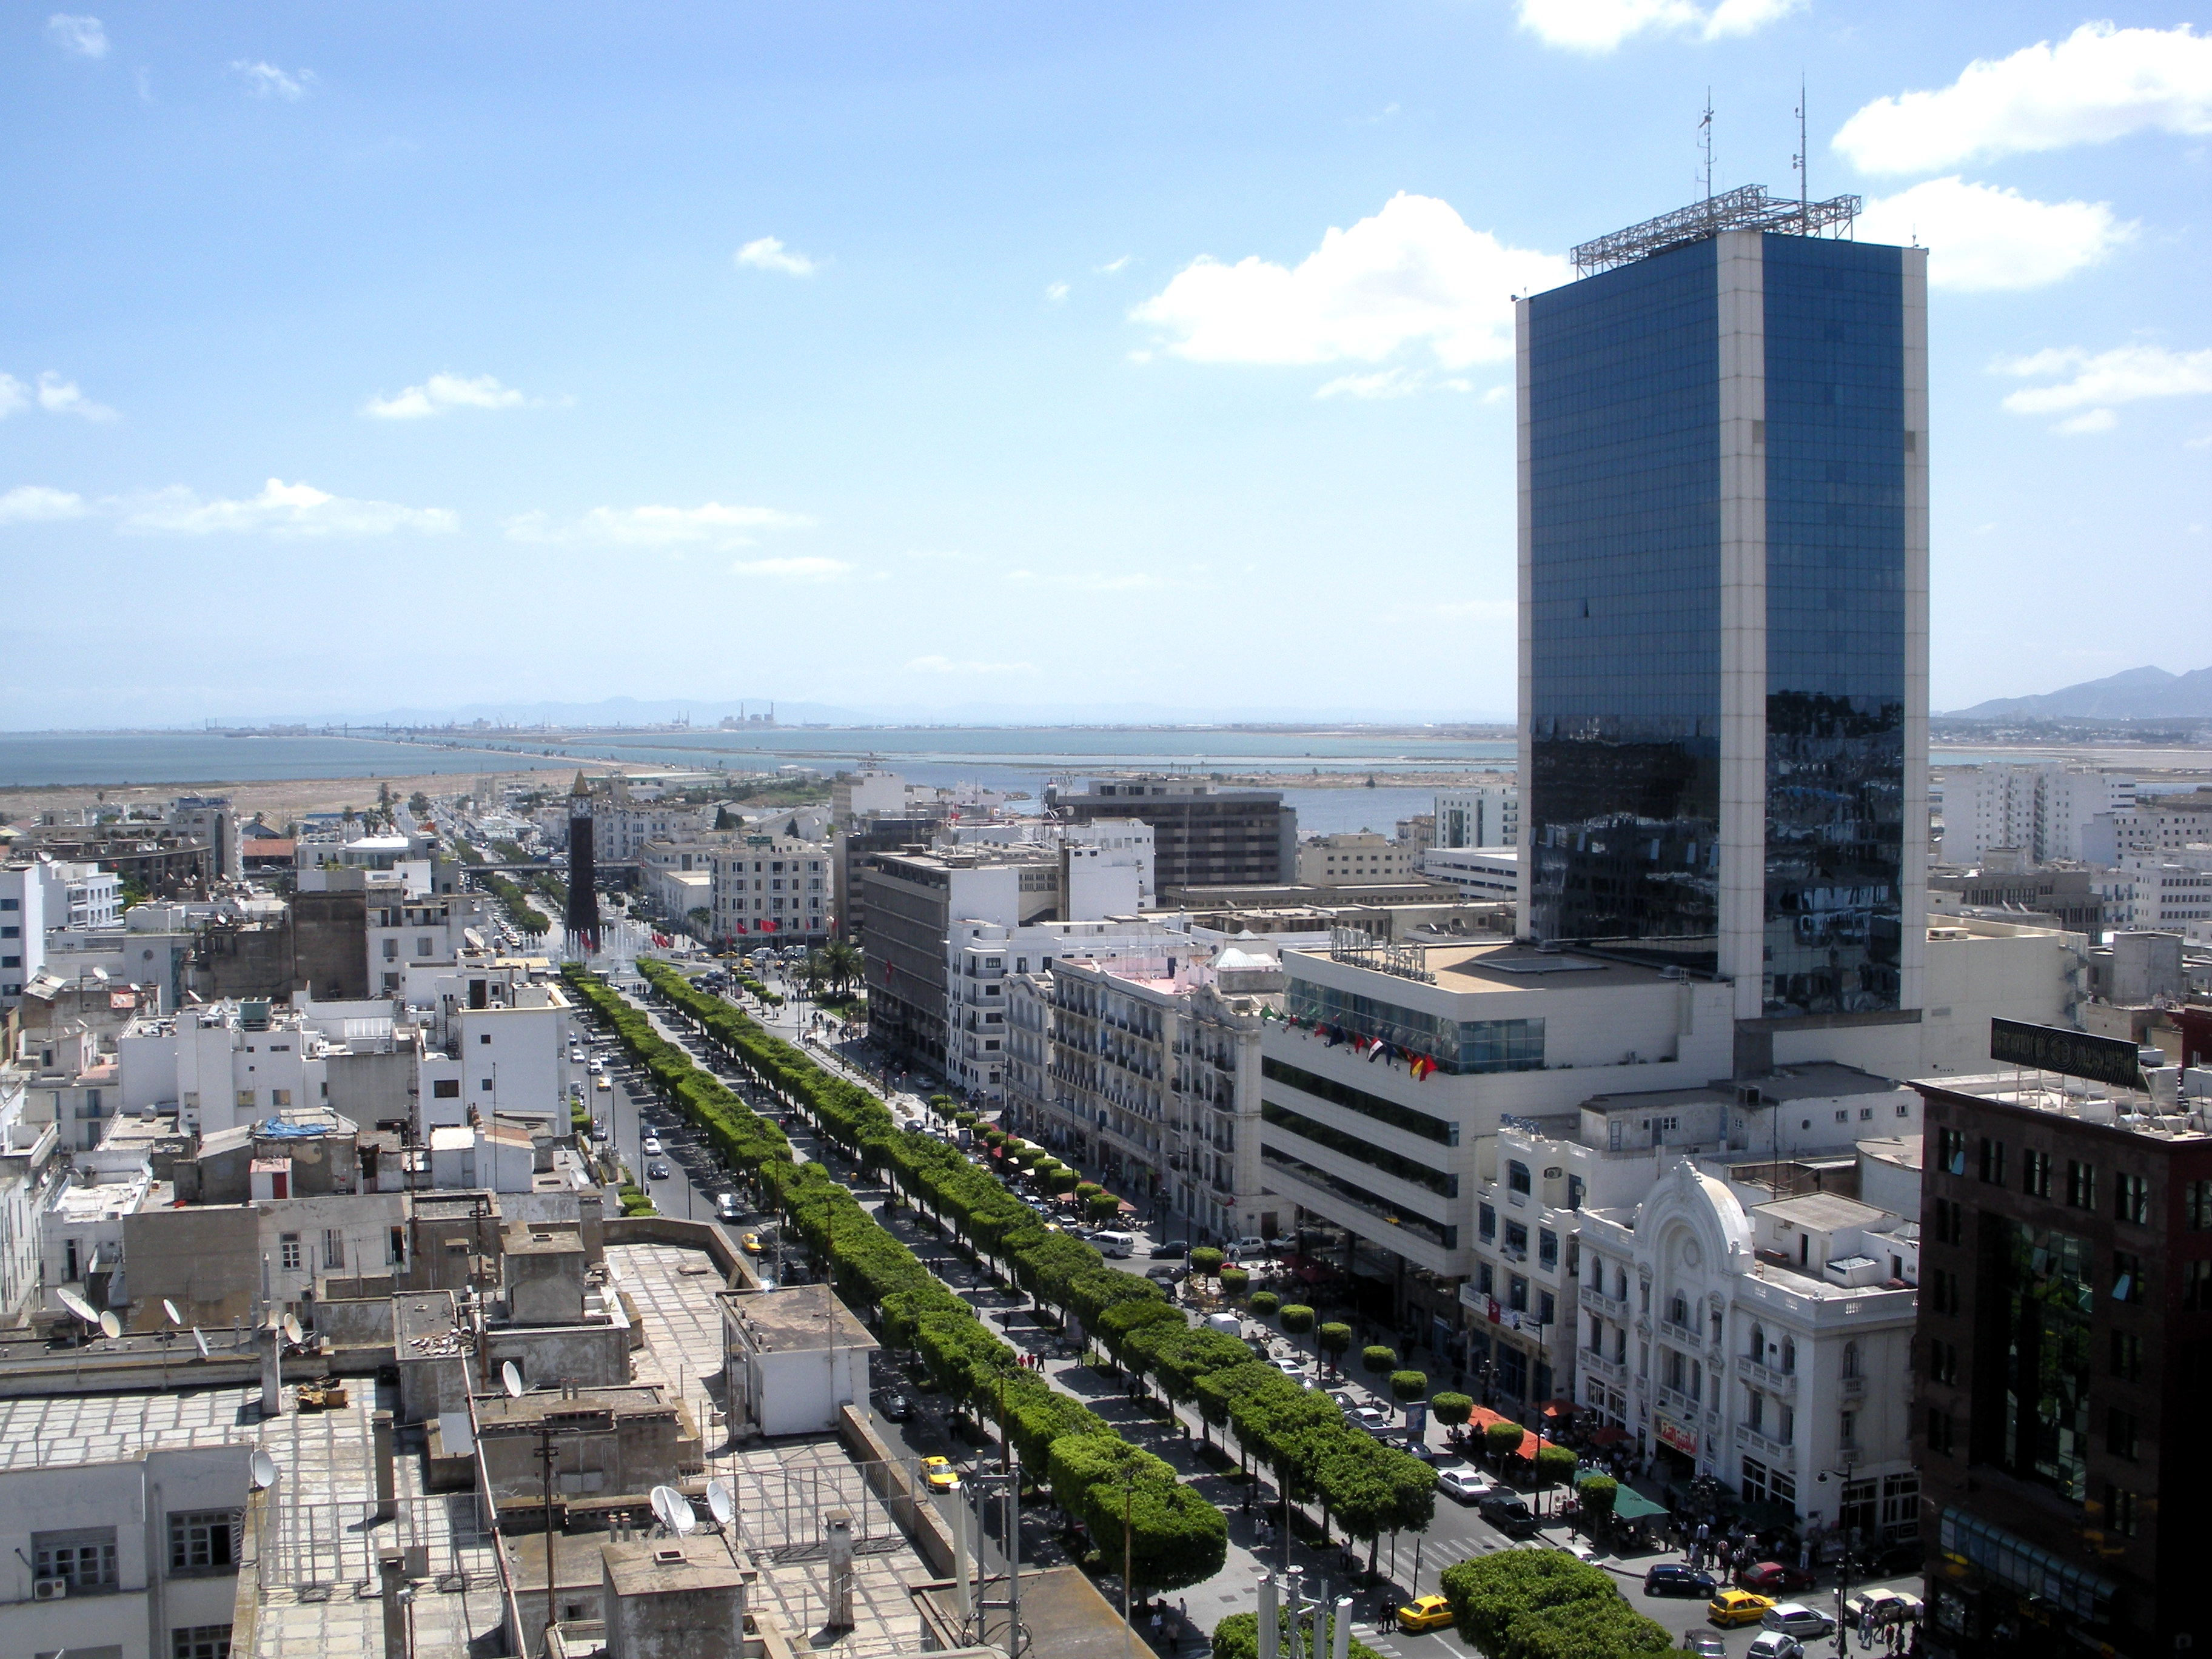 Hotel Tunis Centre Ville